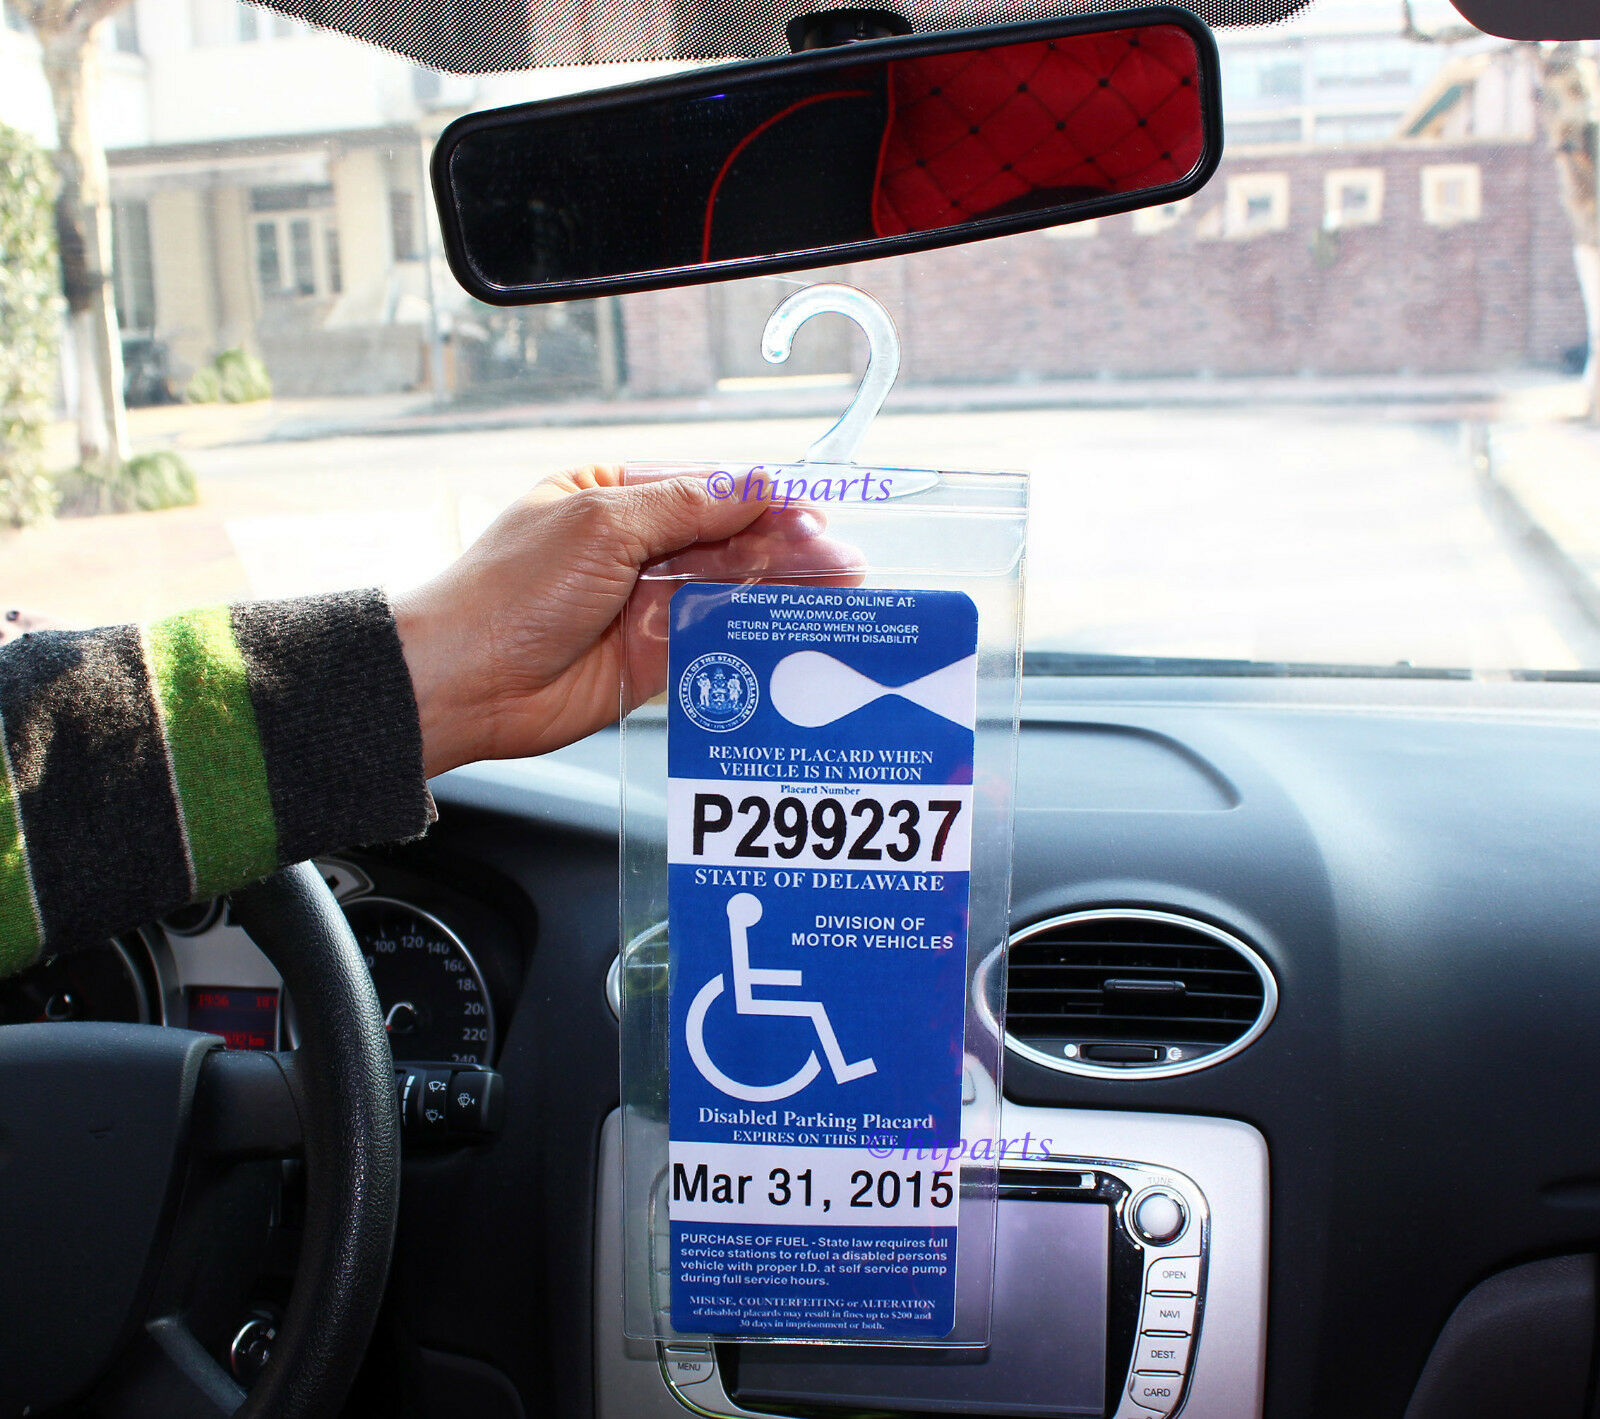 2x Handicap Parking Permit Placard Protector Cover Hanger ...